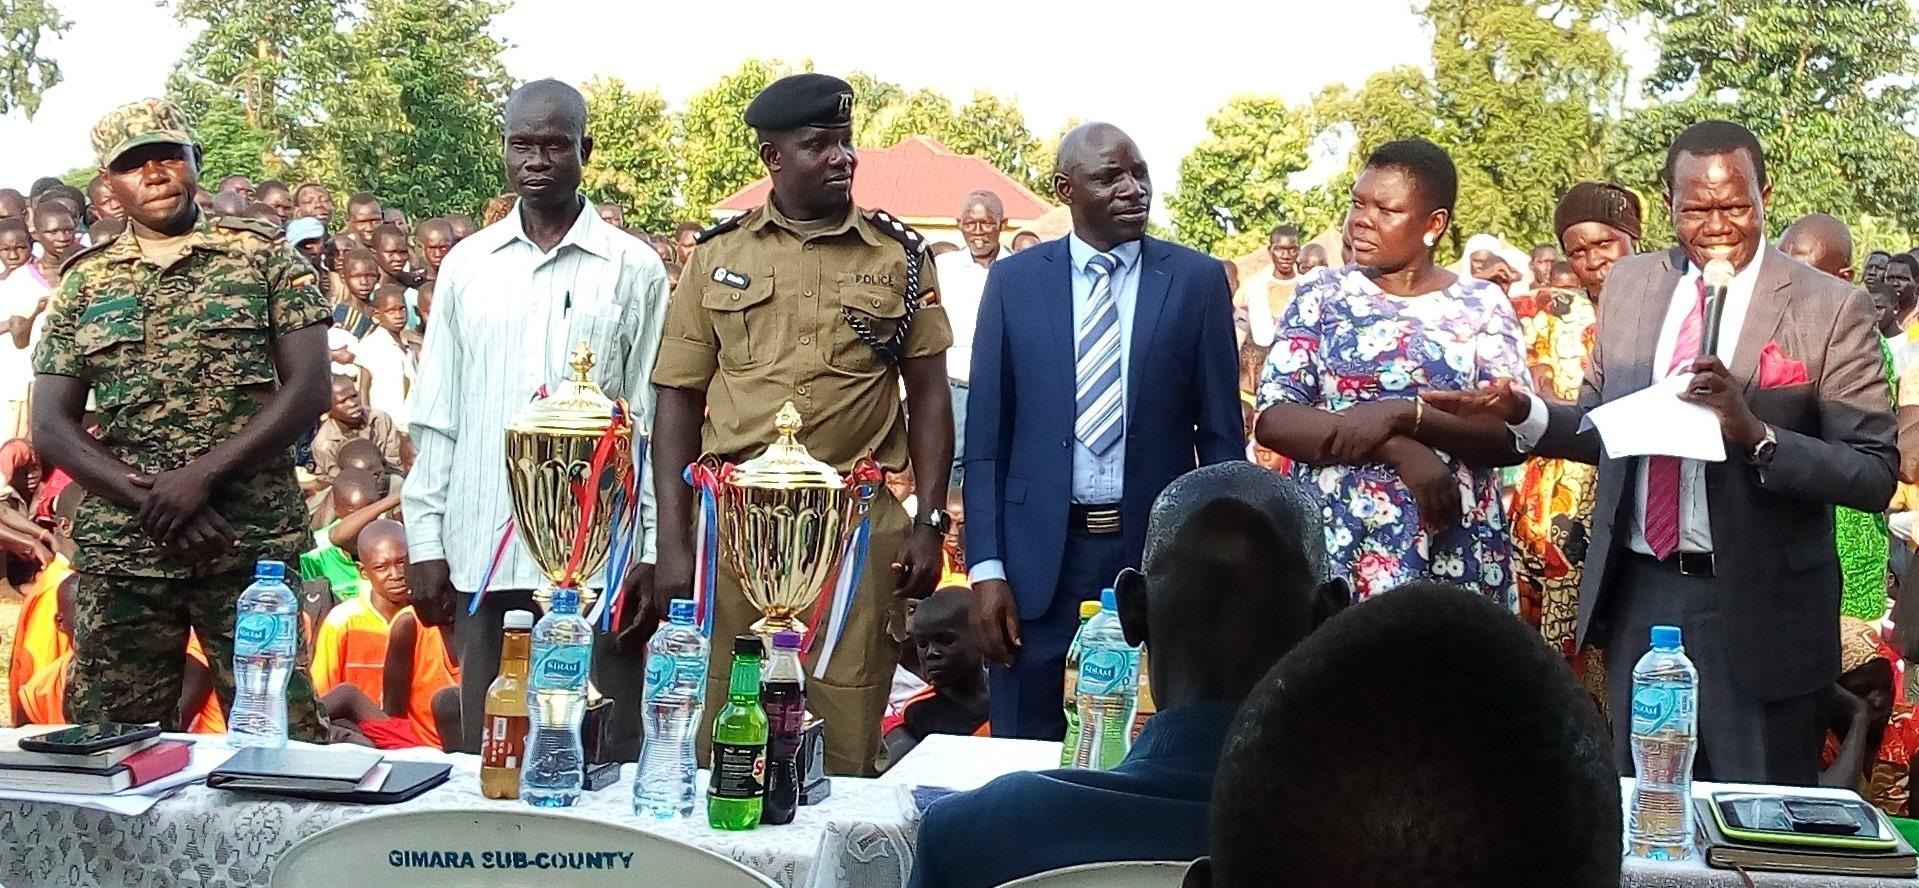 Top Leaders of Obongi Addressing People